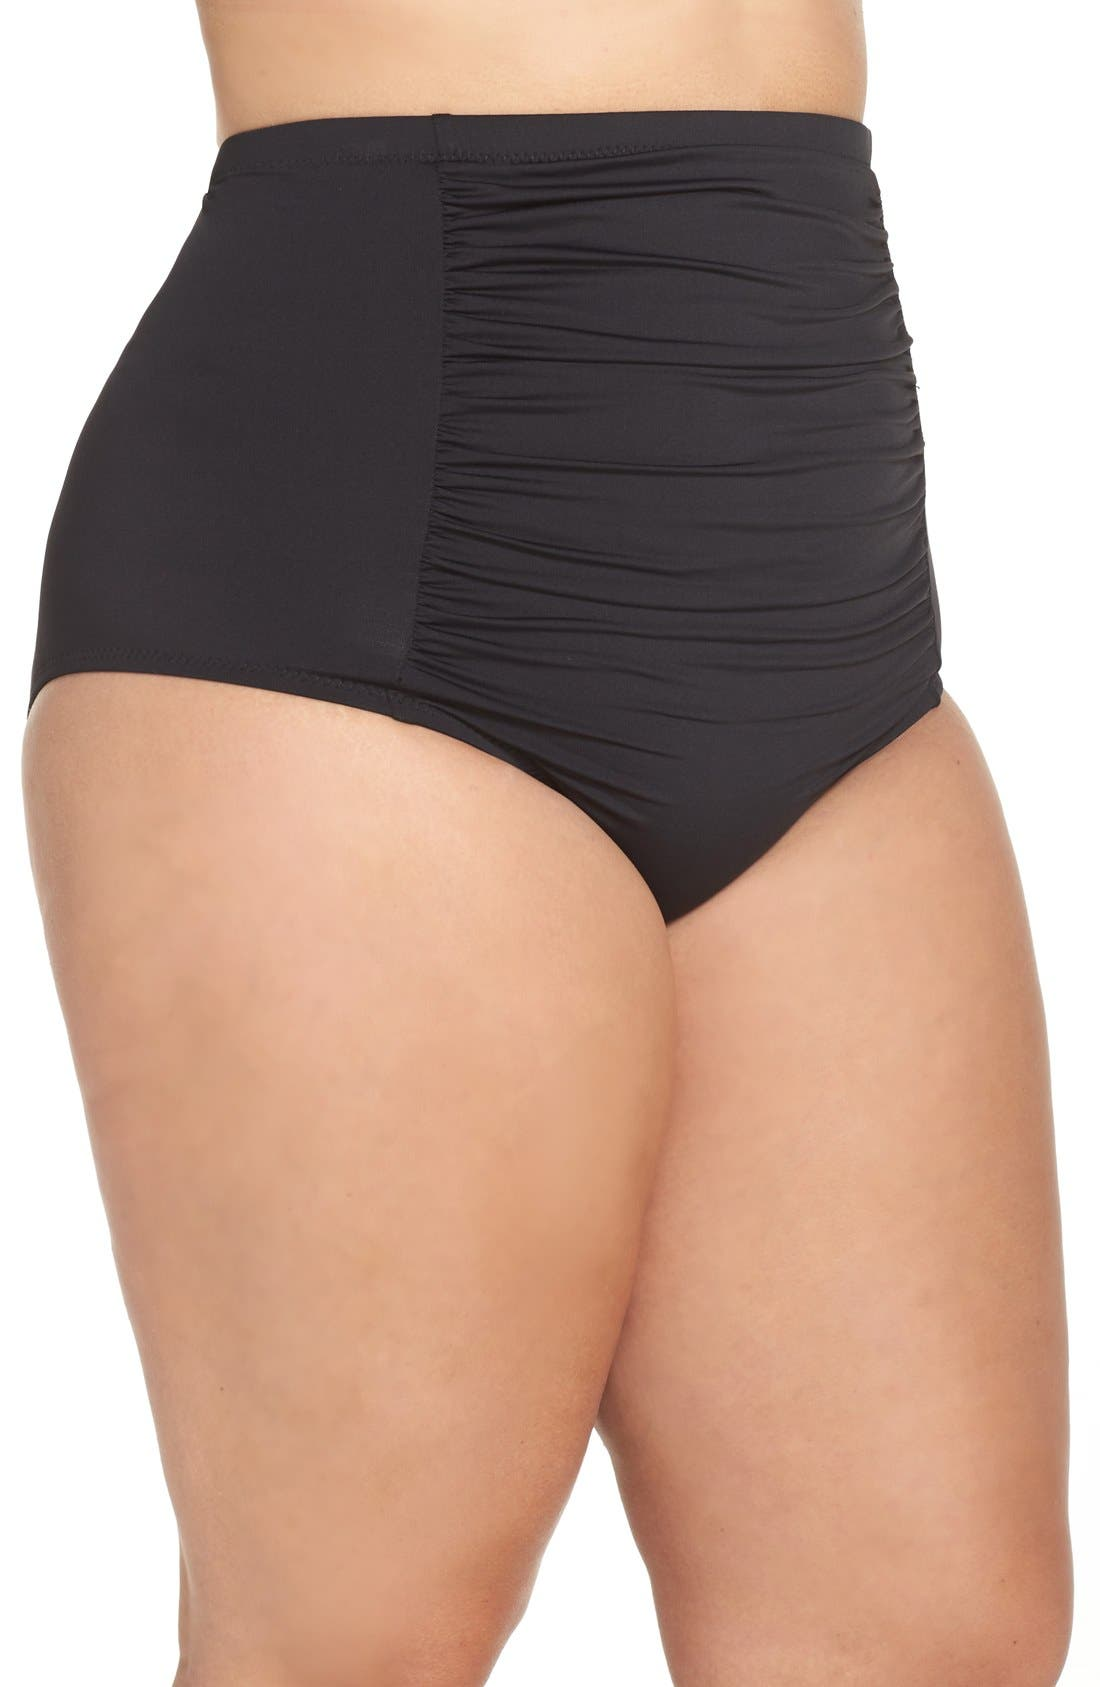 Alternate Image 3  - Becca Etc. Color Code High Waist Bikini Bottoms (Plus Size)